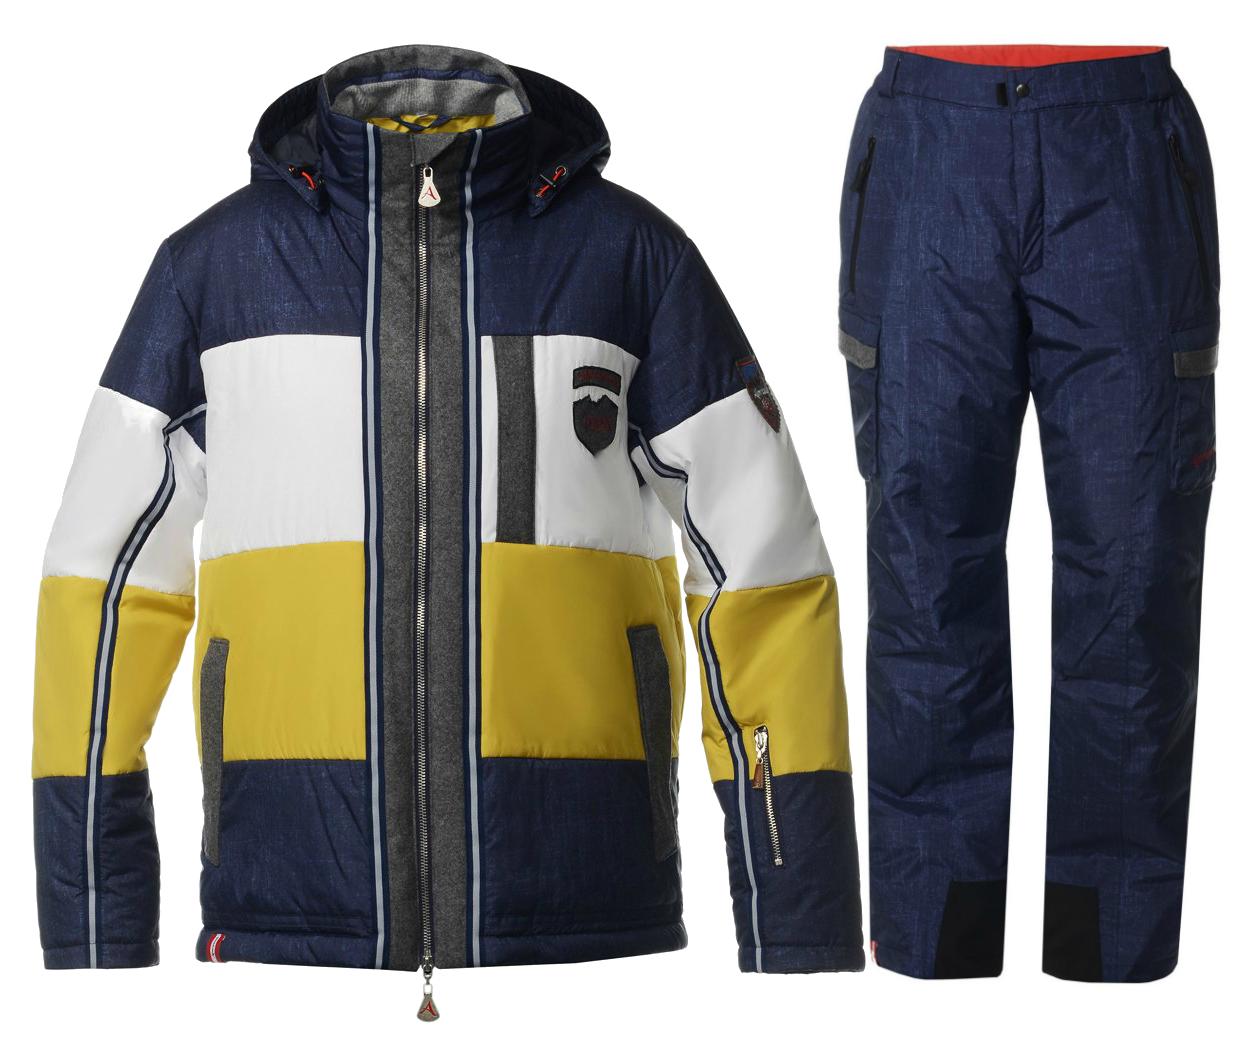 Мужской горнолыжный костюм Almrausch Steinpass-Hochbruck 320109-321300 джинс